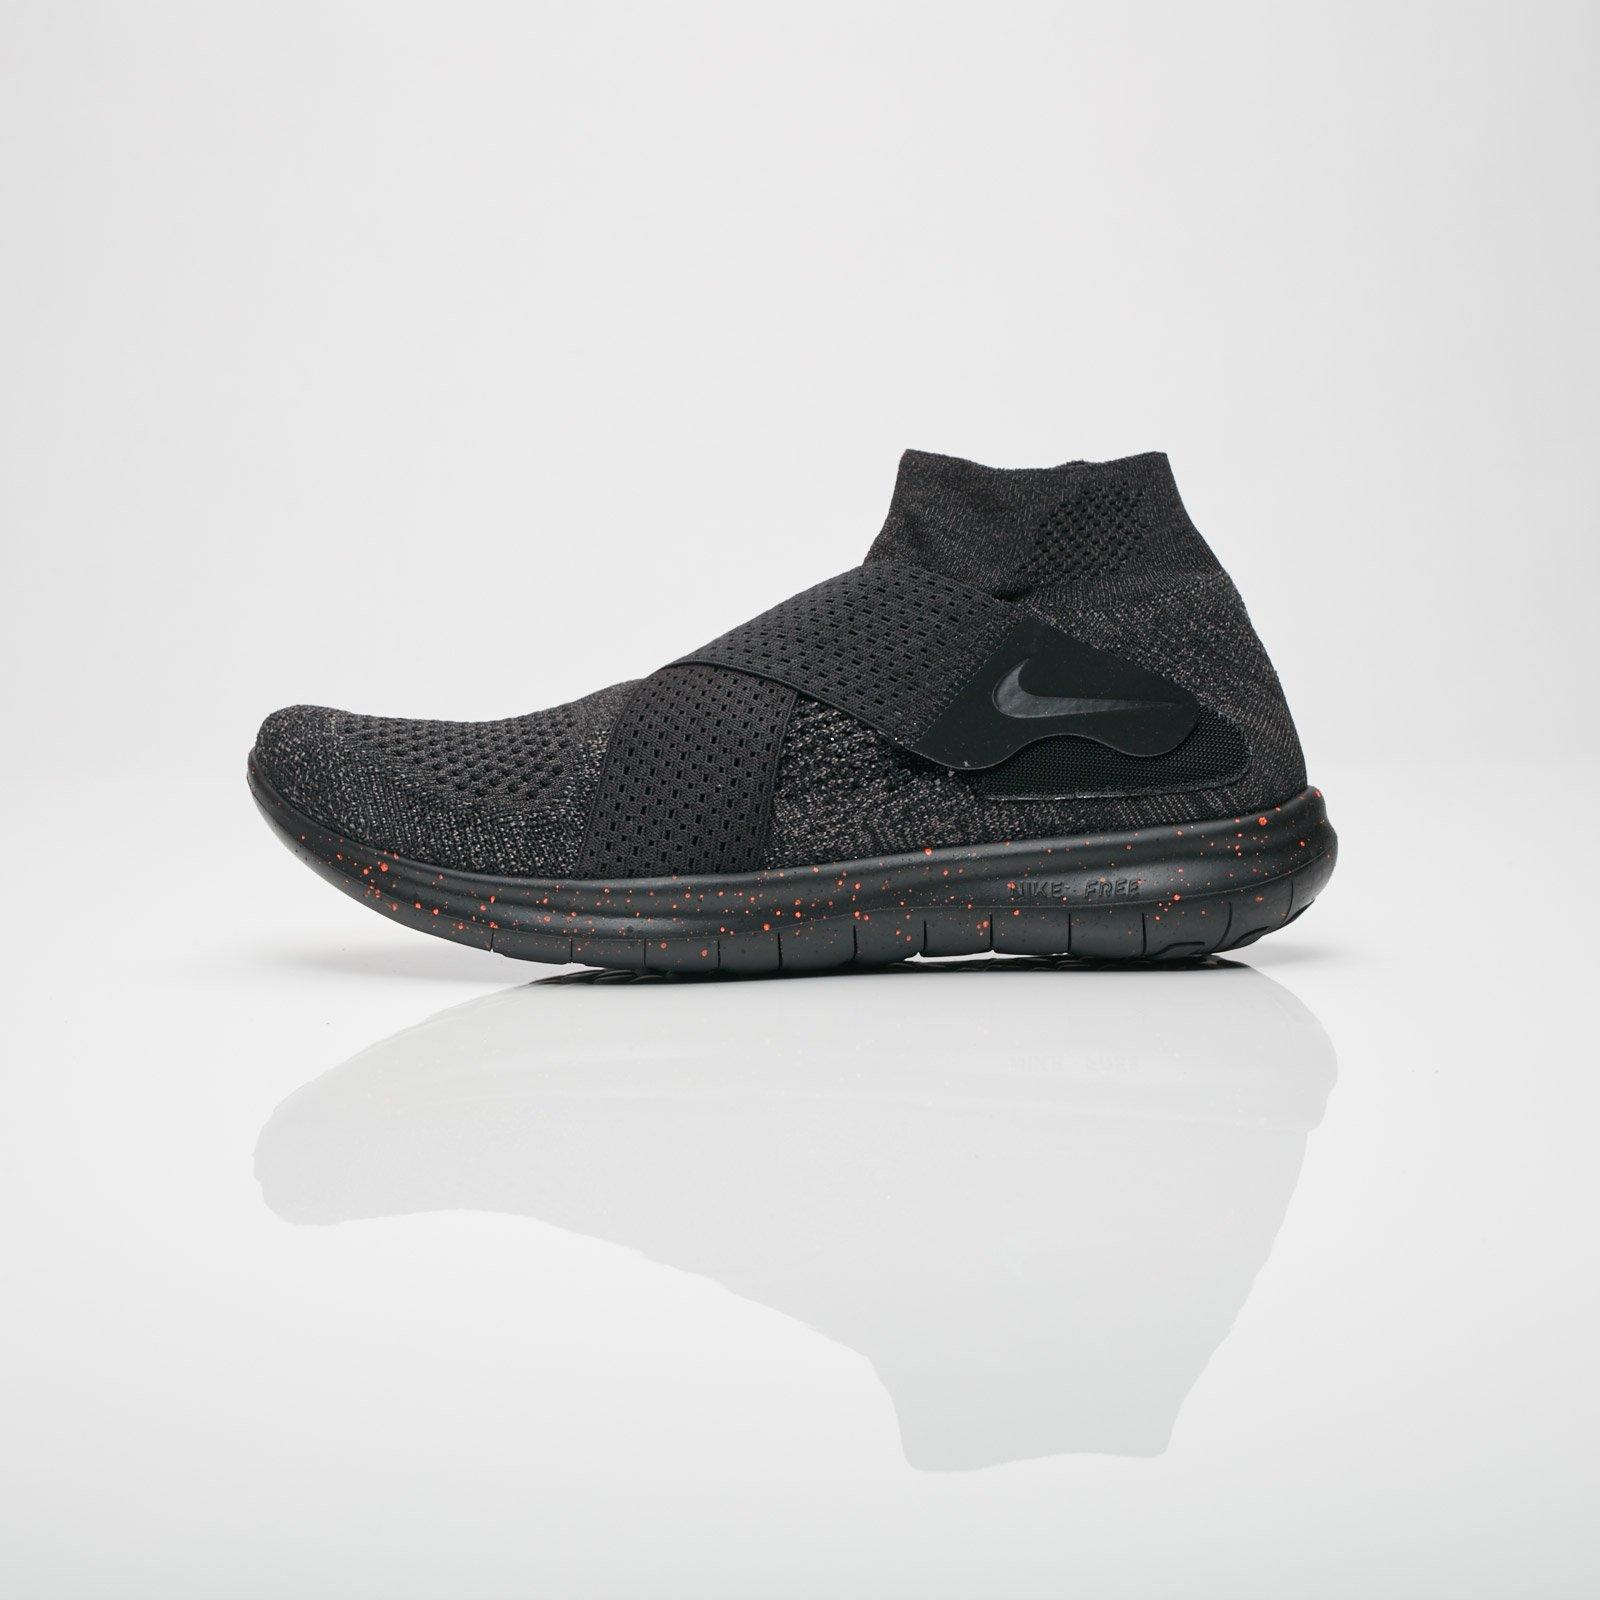 44c17bbcfd620 Nike Free RN Motion FK 2017 - 883291-010 - Sneakersnstuff